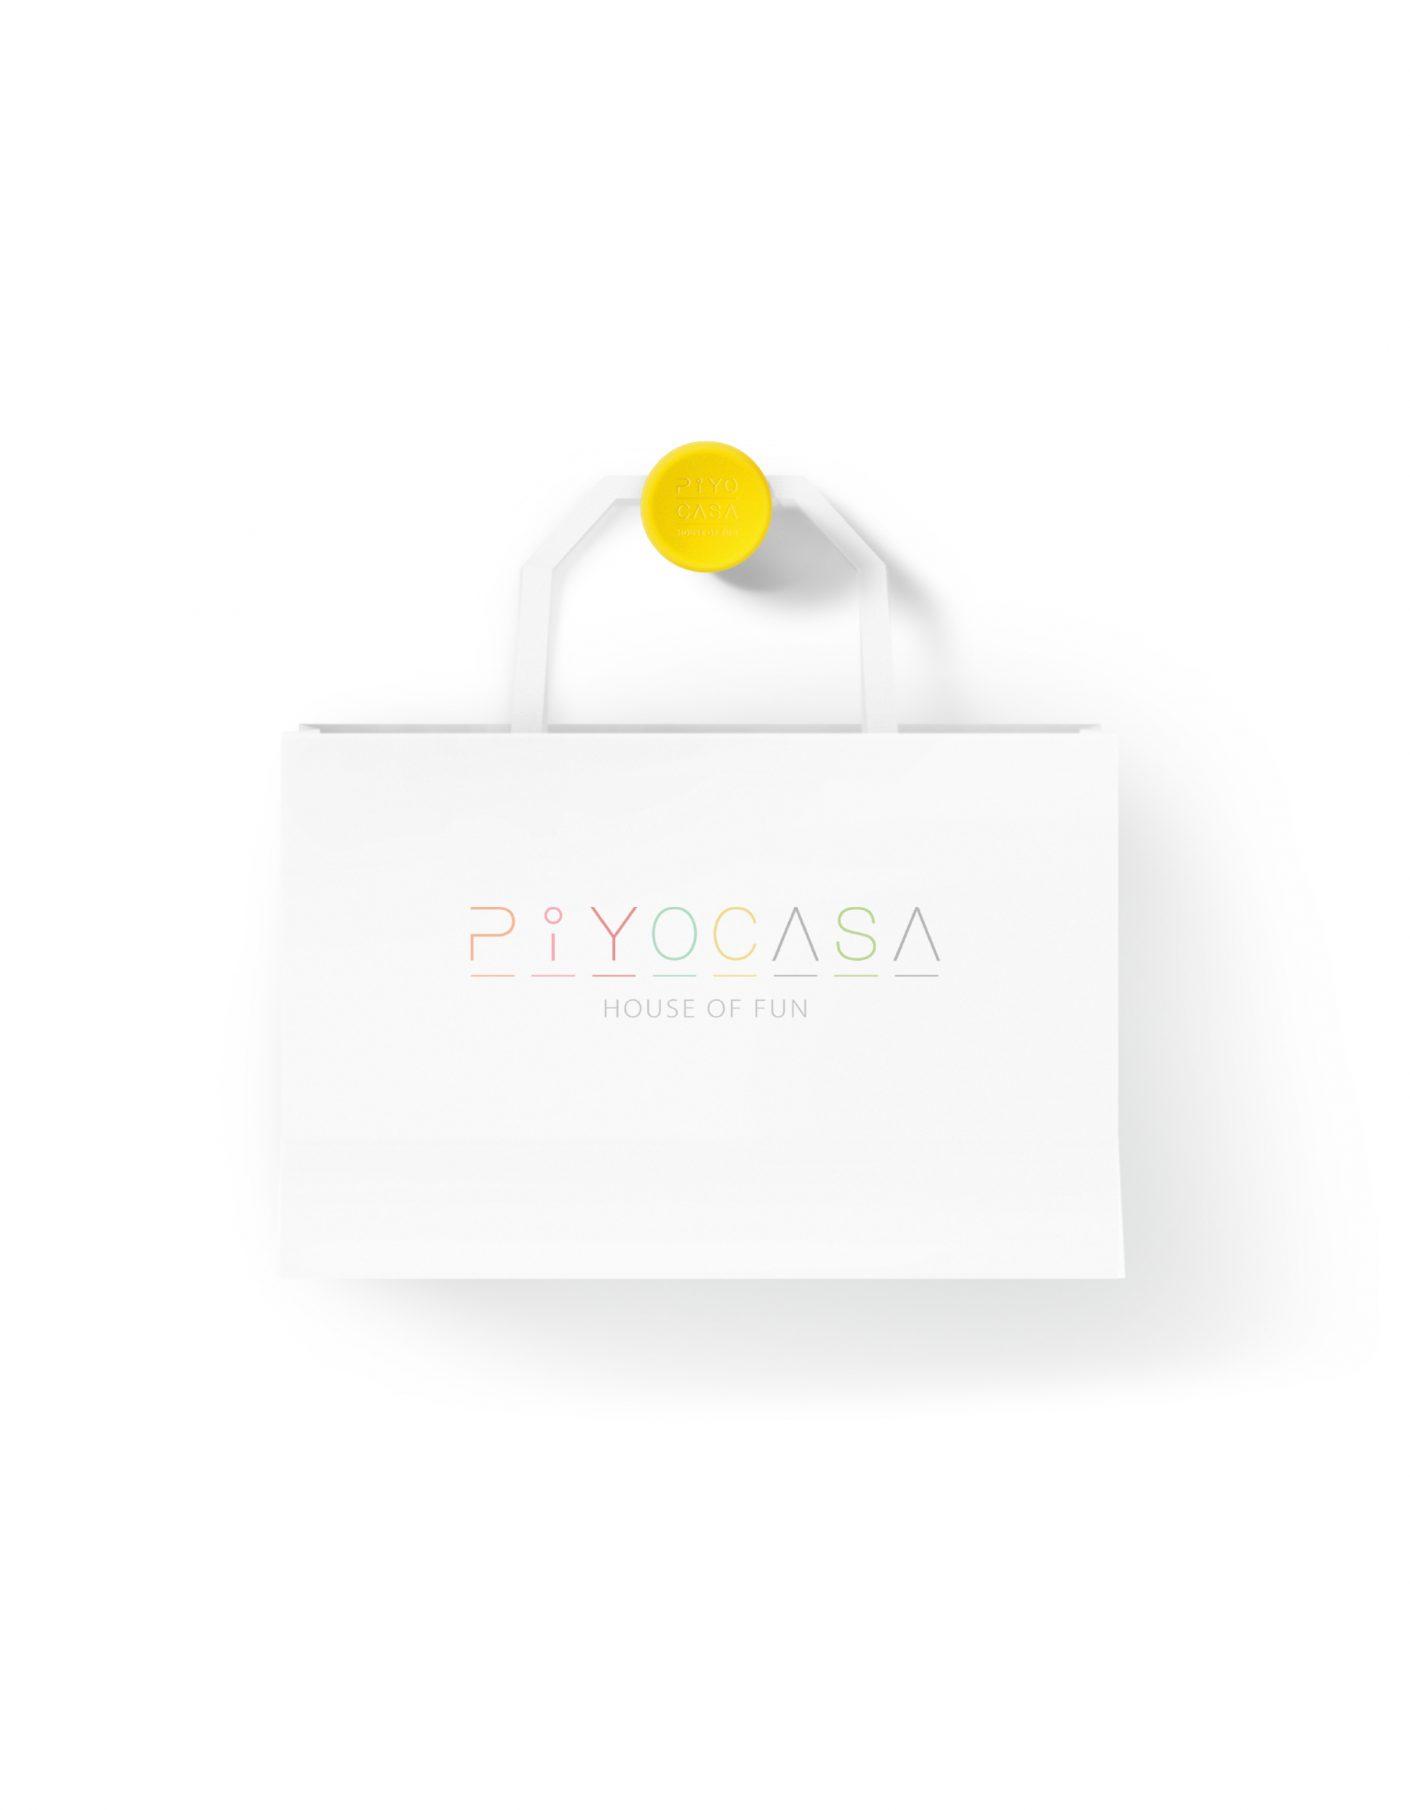 Piyocasa TN